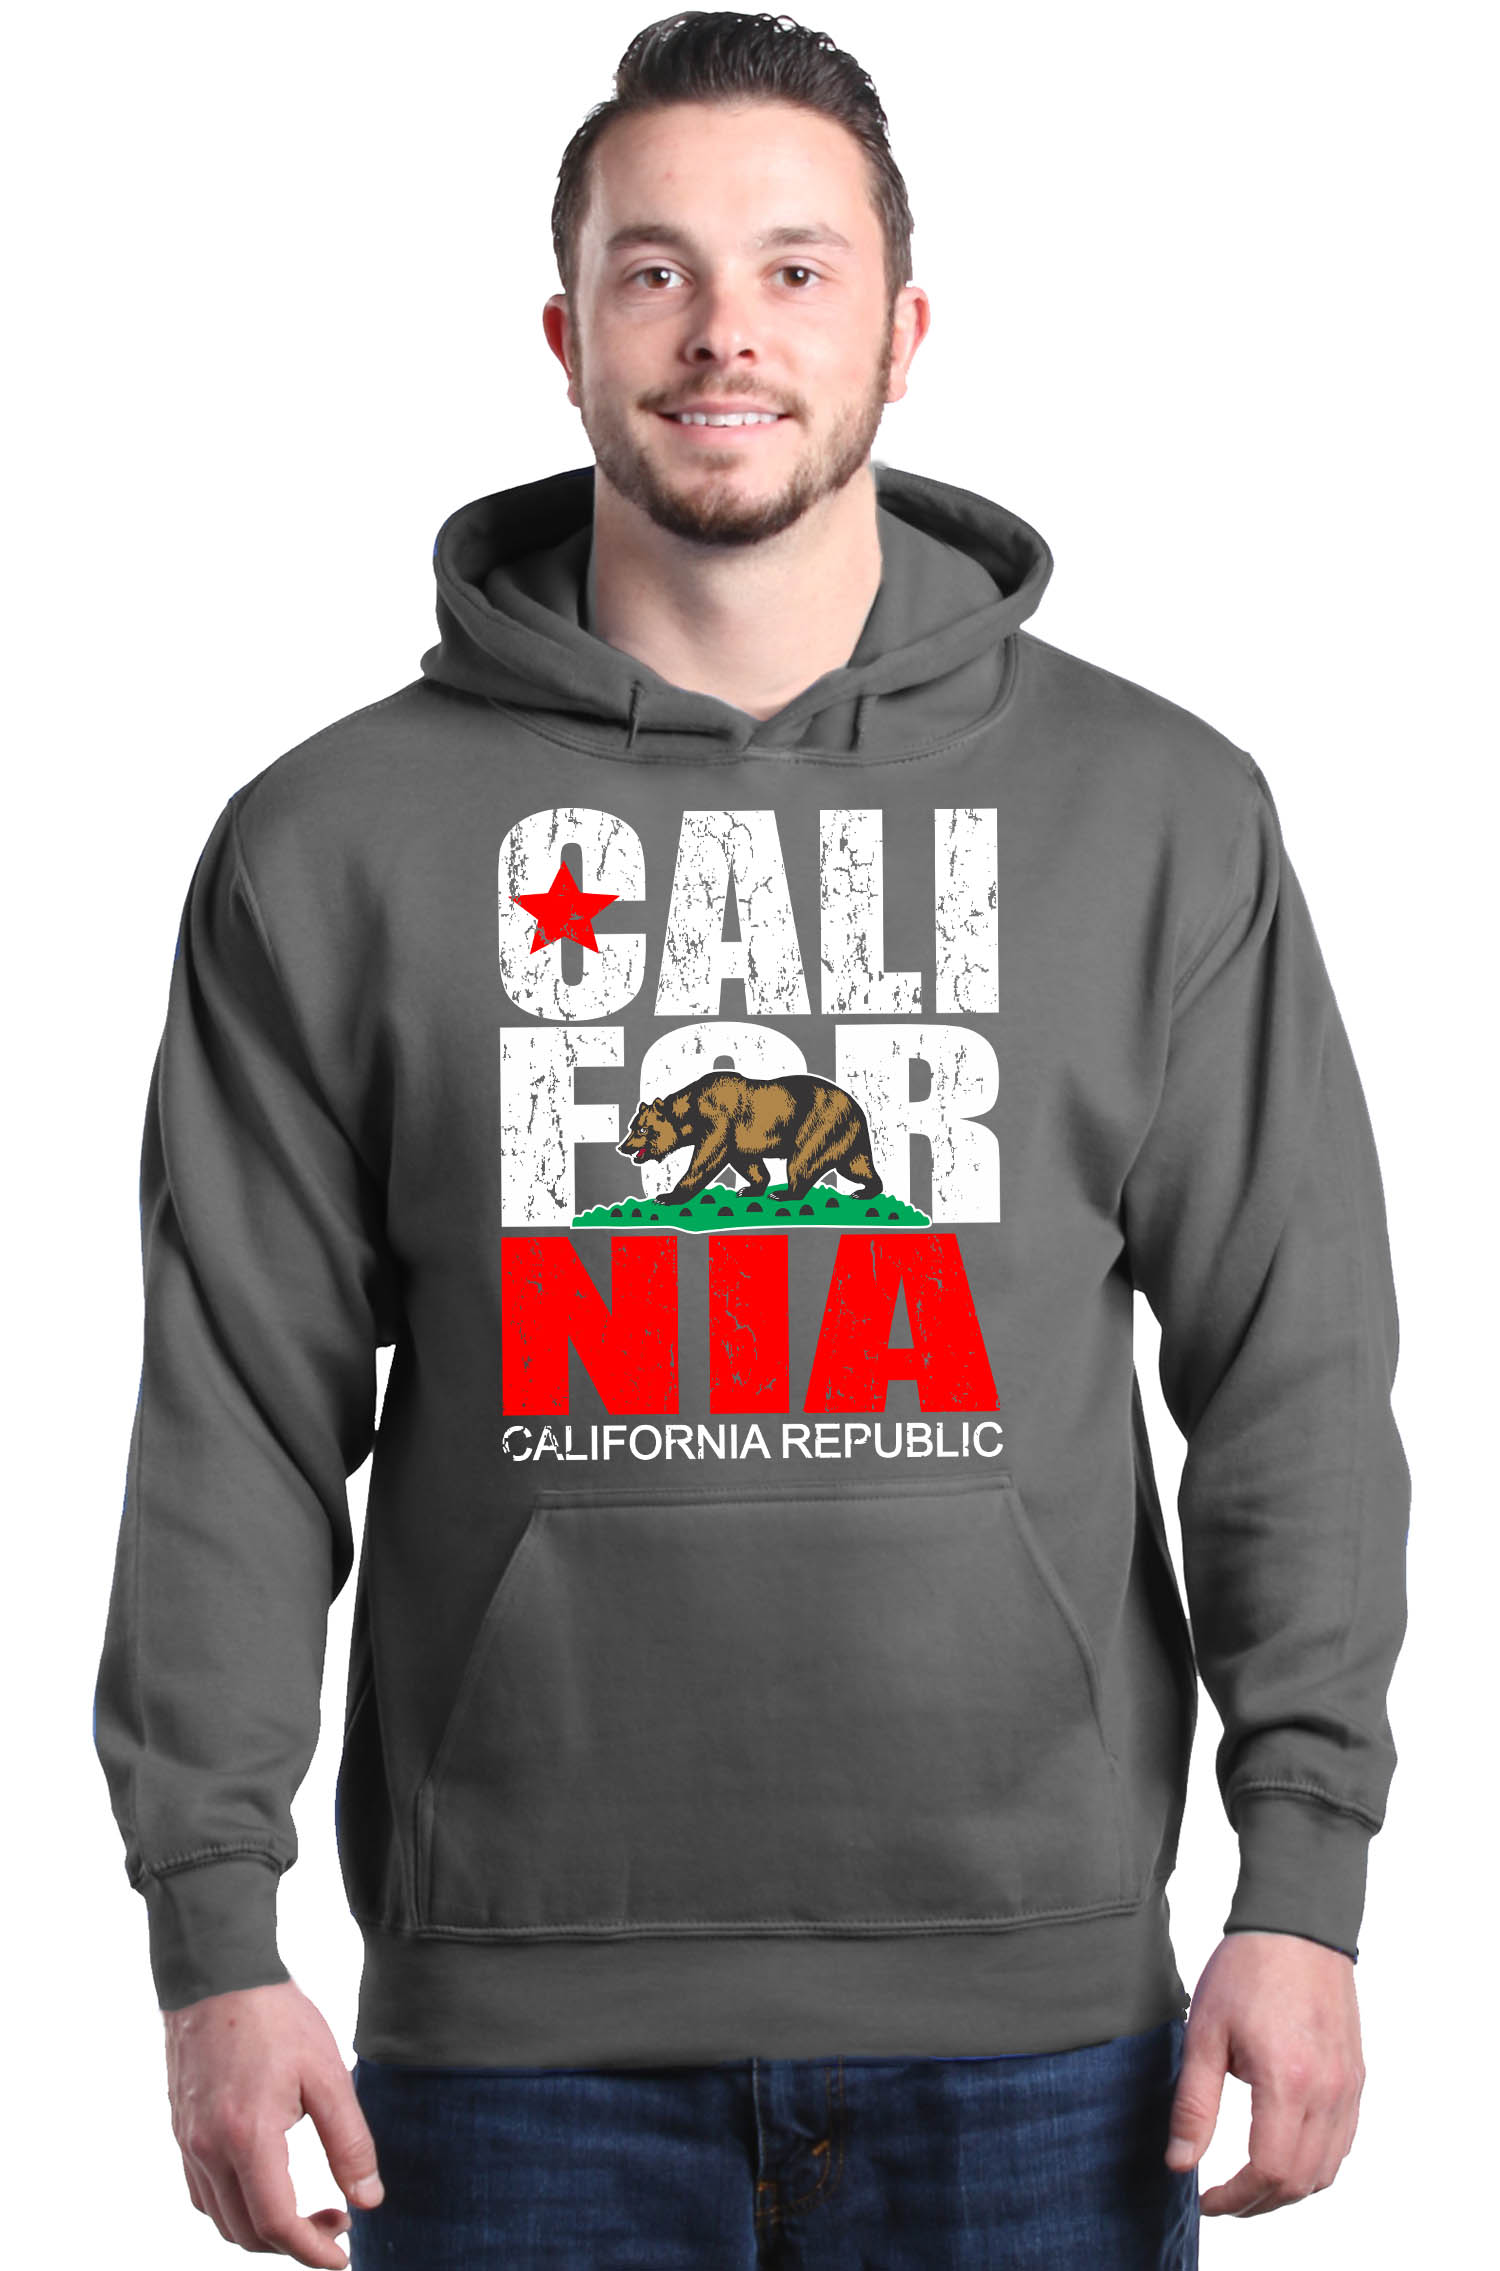 New Men/'s CALIFORNIA REPUBLIC Hoodie pullover black sweatshirt Free Shipping